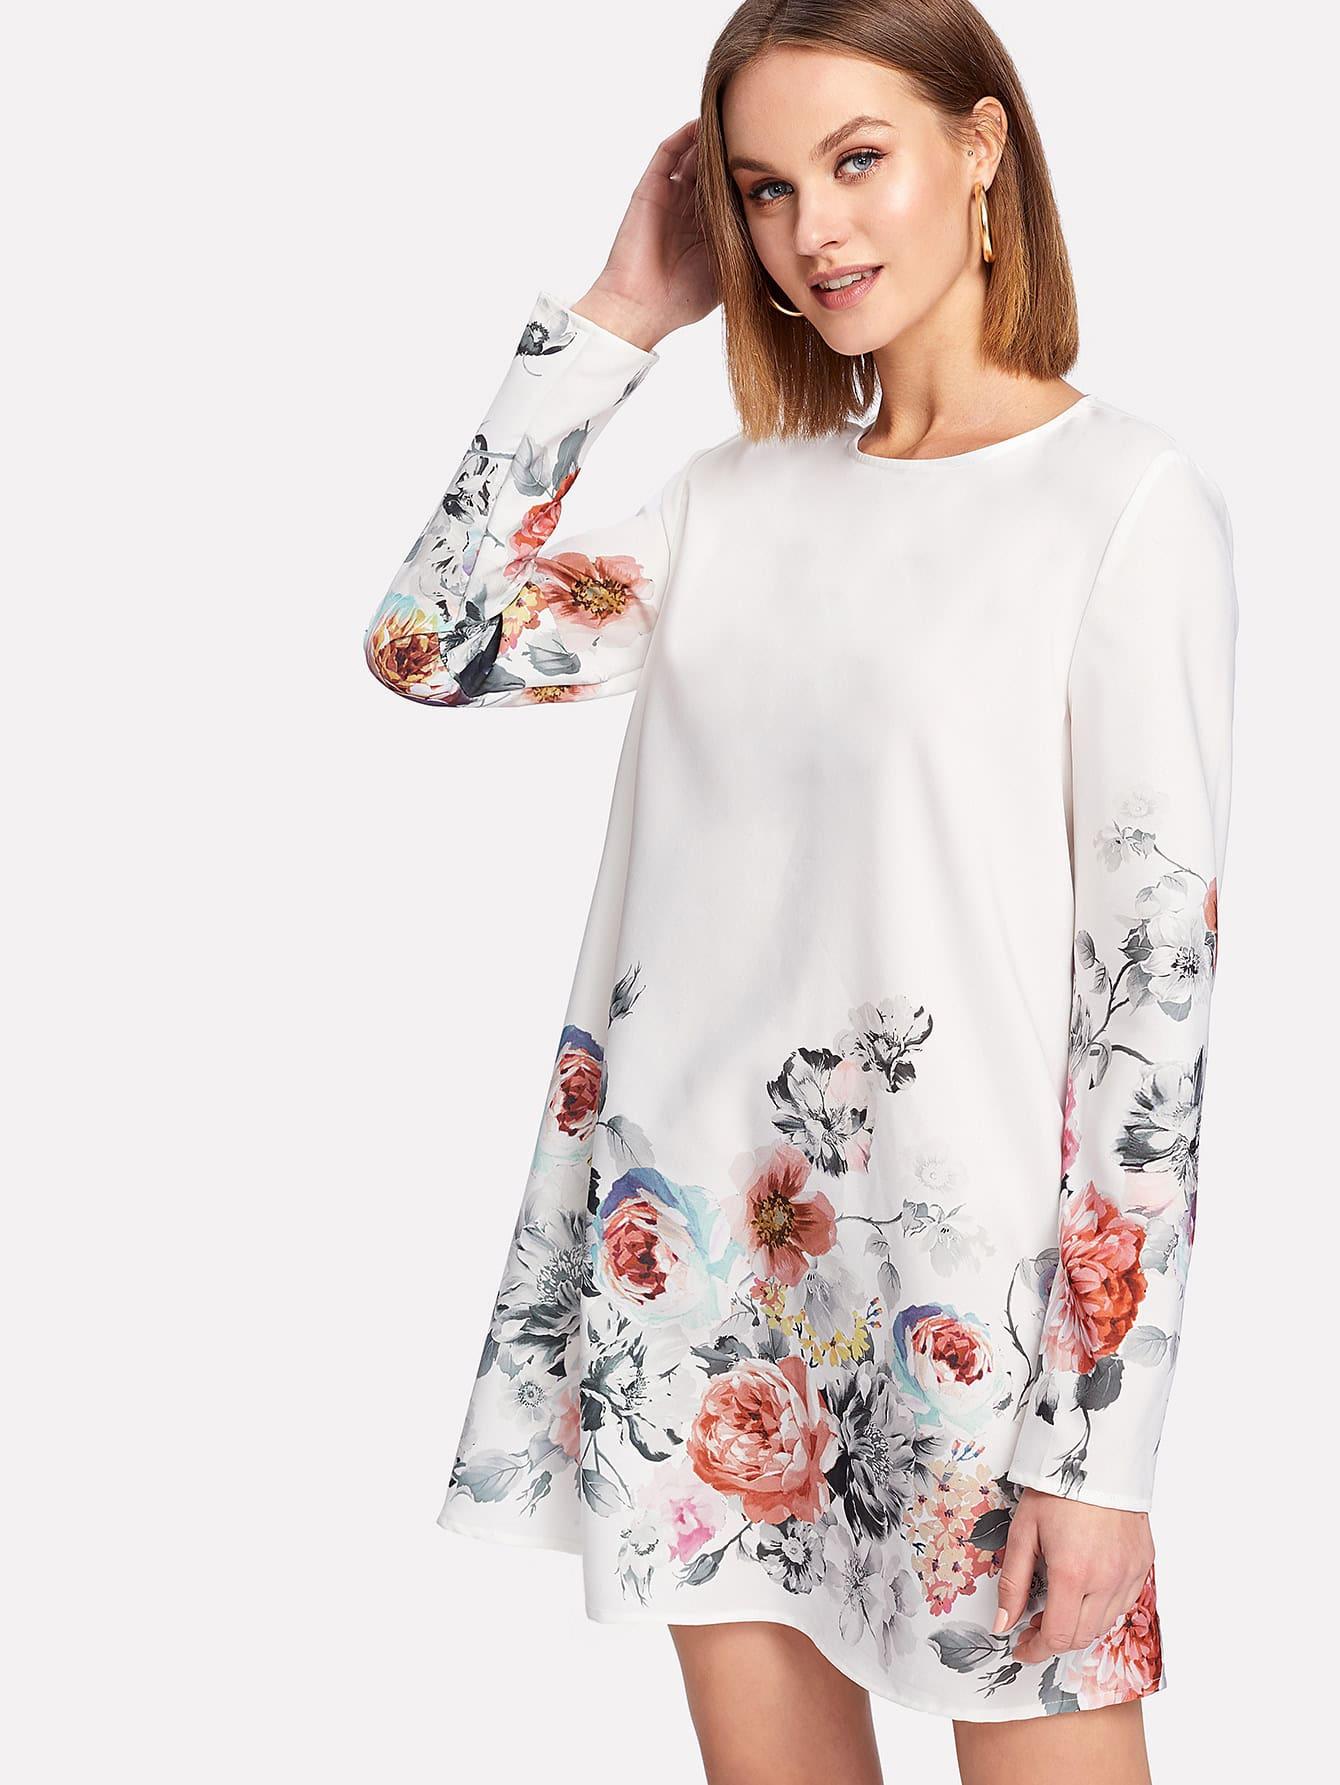 Flower Print Keyhole Back Dress джеймс эшер bhakta ranga rasa india новый взгляд mp3